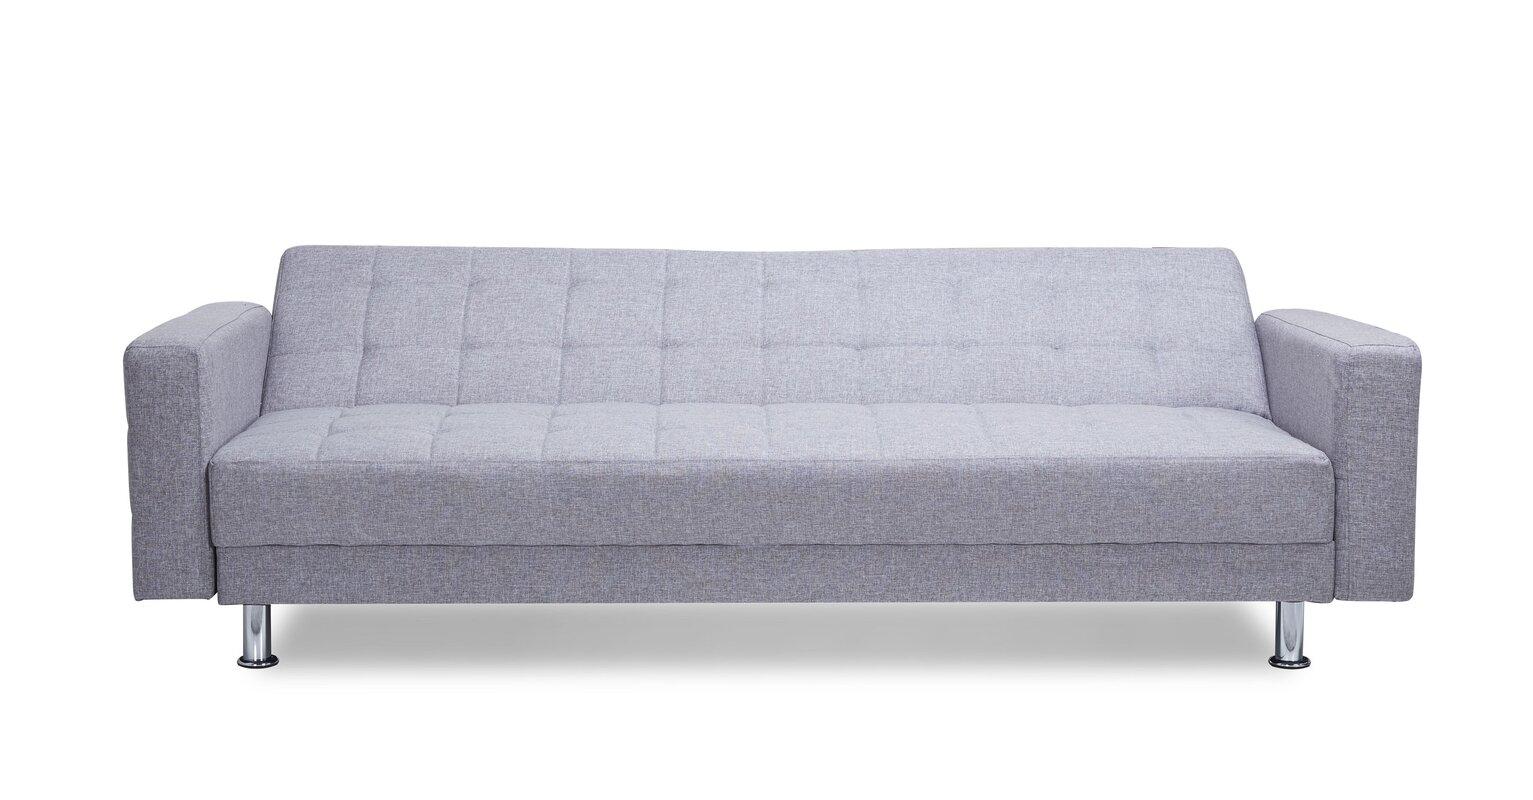 Wade Logan Spirit Lake Convertible Sleeper Sofa Amp Reviews